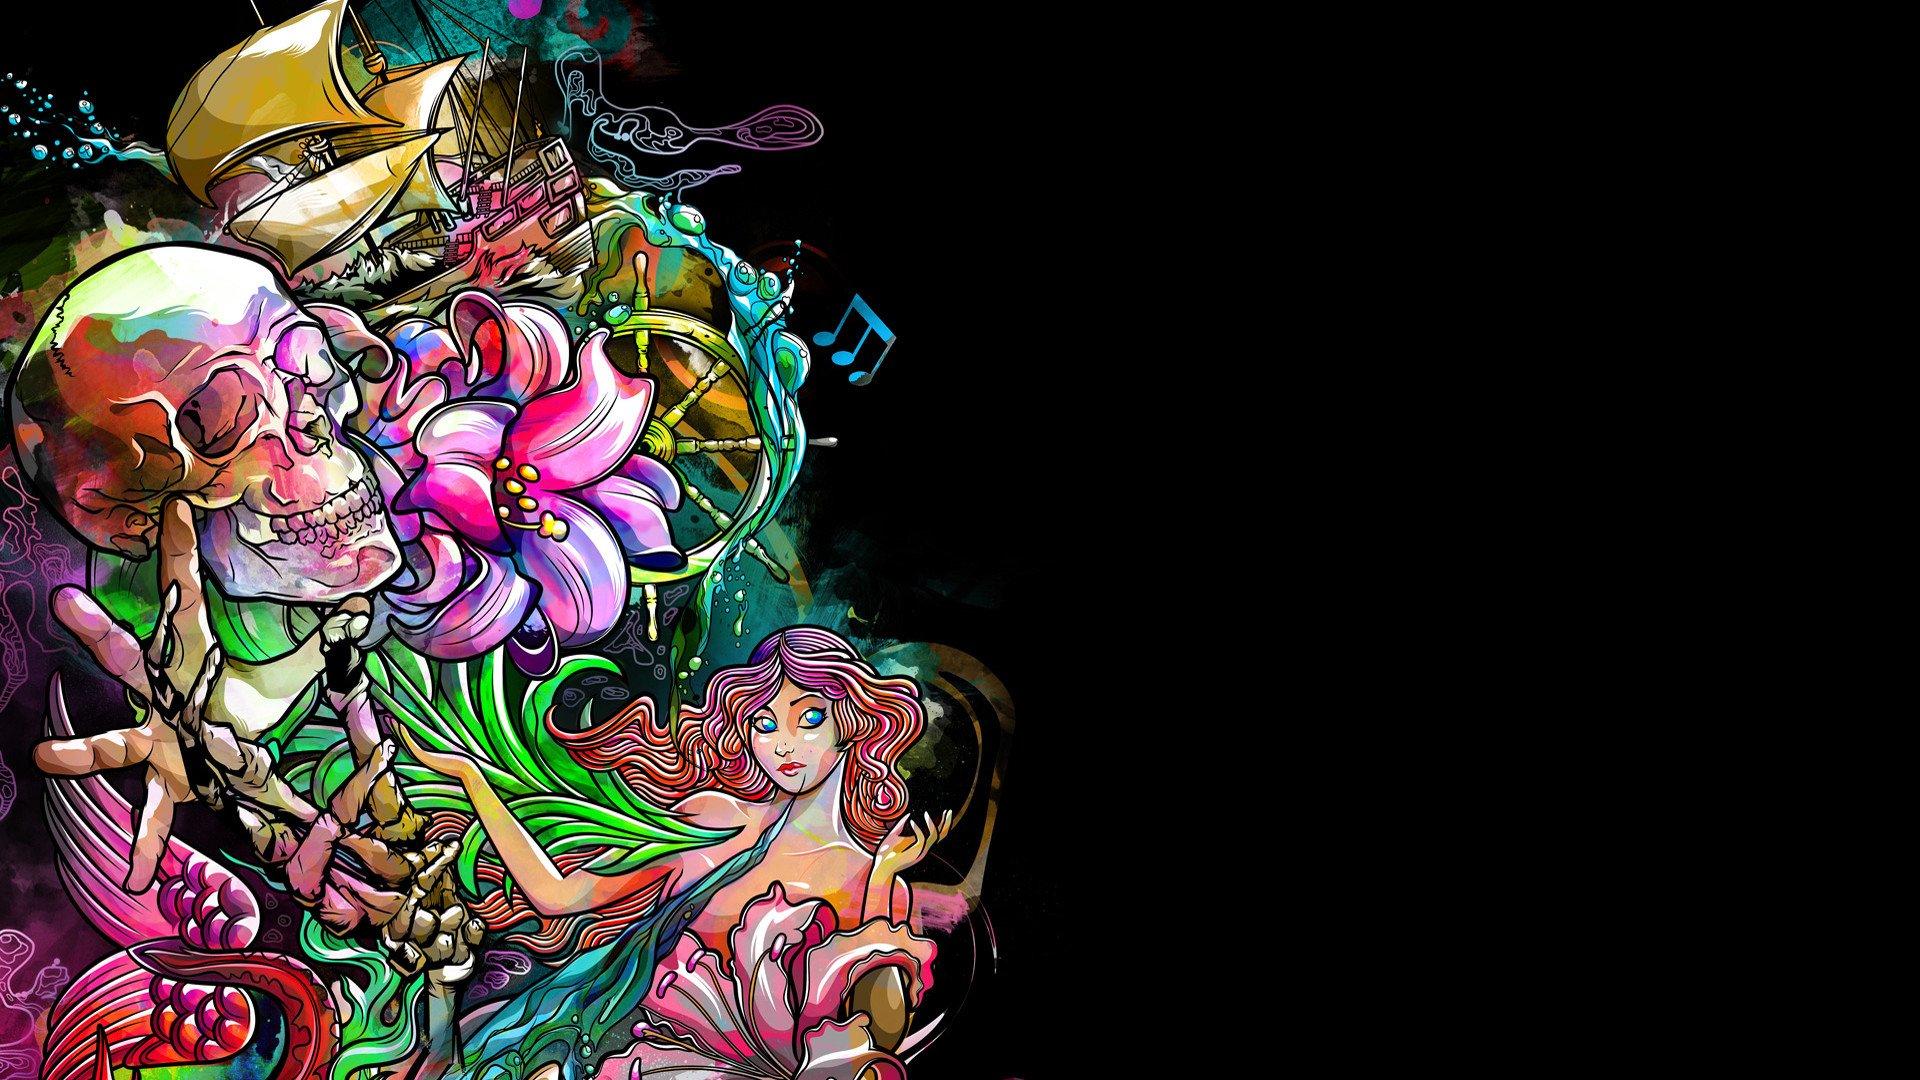 wallpaper tattoo colourful - photo #15